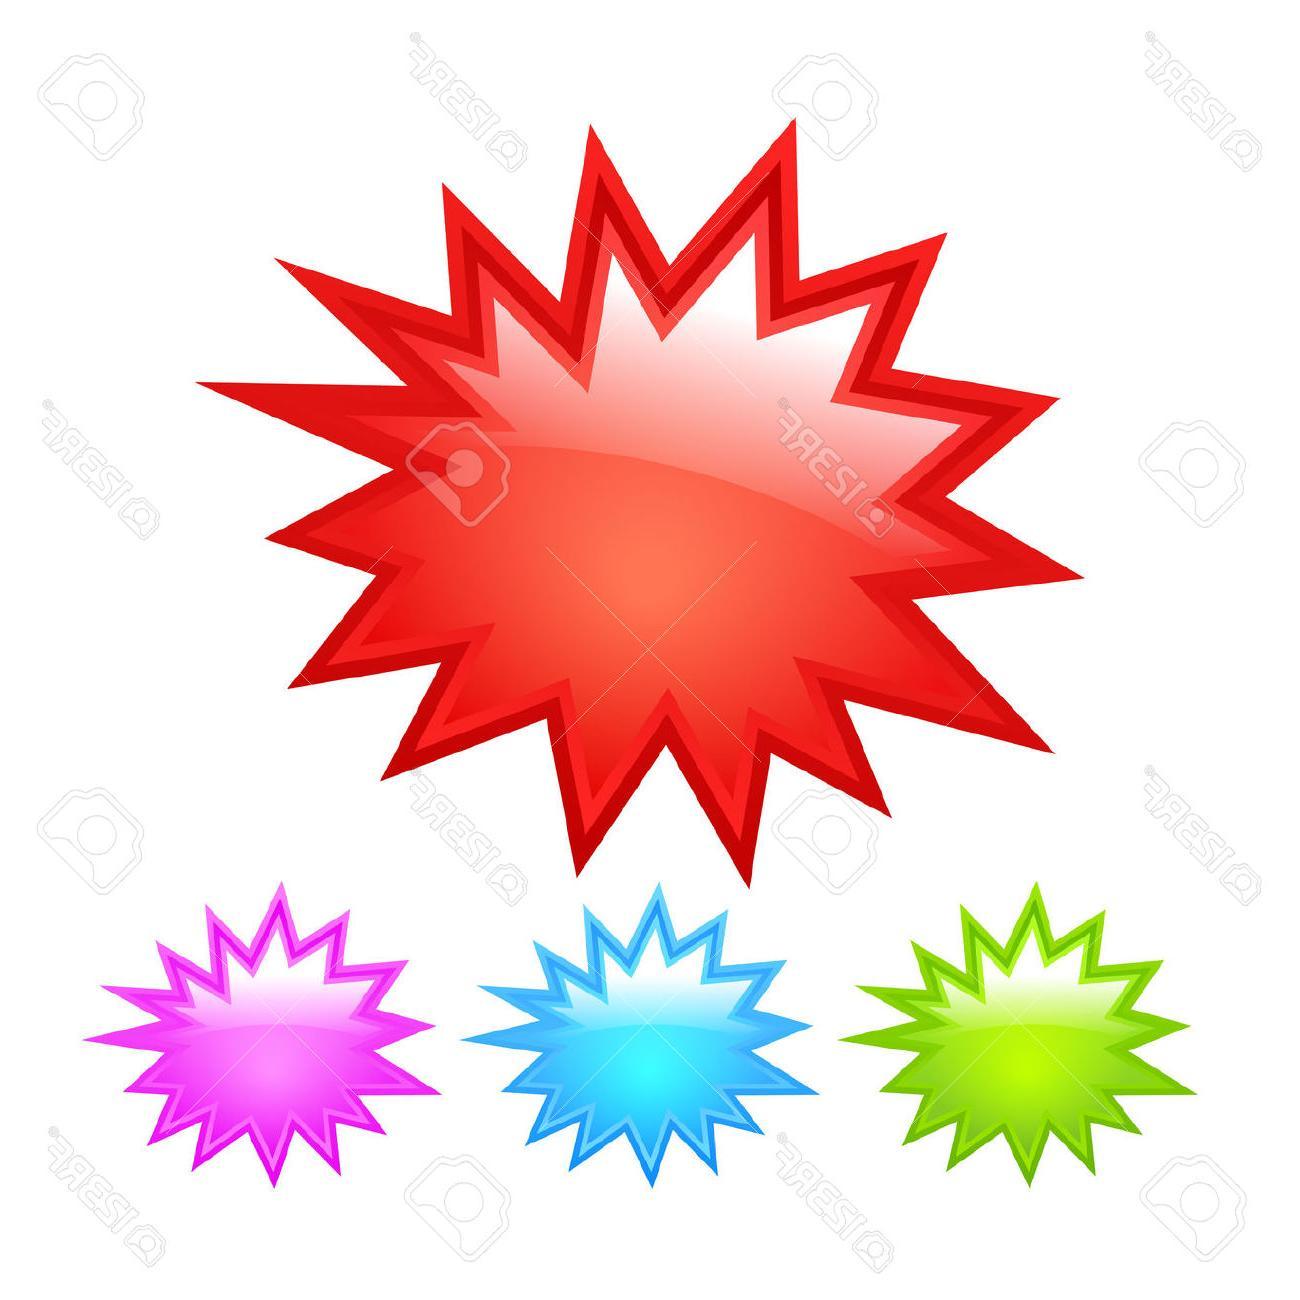 1300x1300 Hd Starburst Icon Stock Vector Burst Star File Free